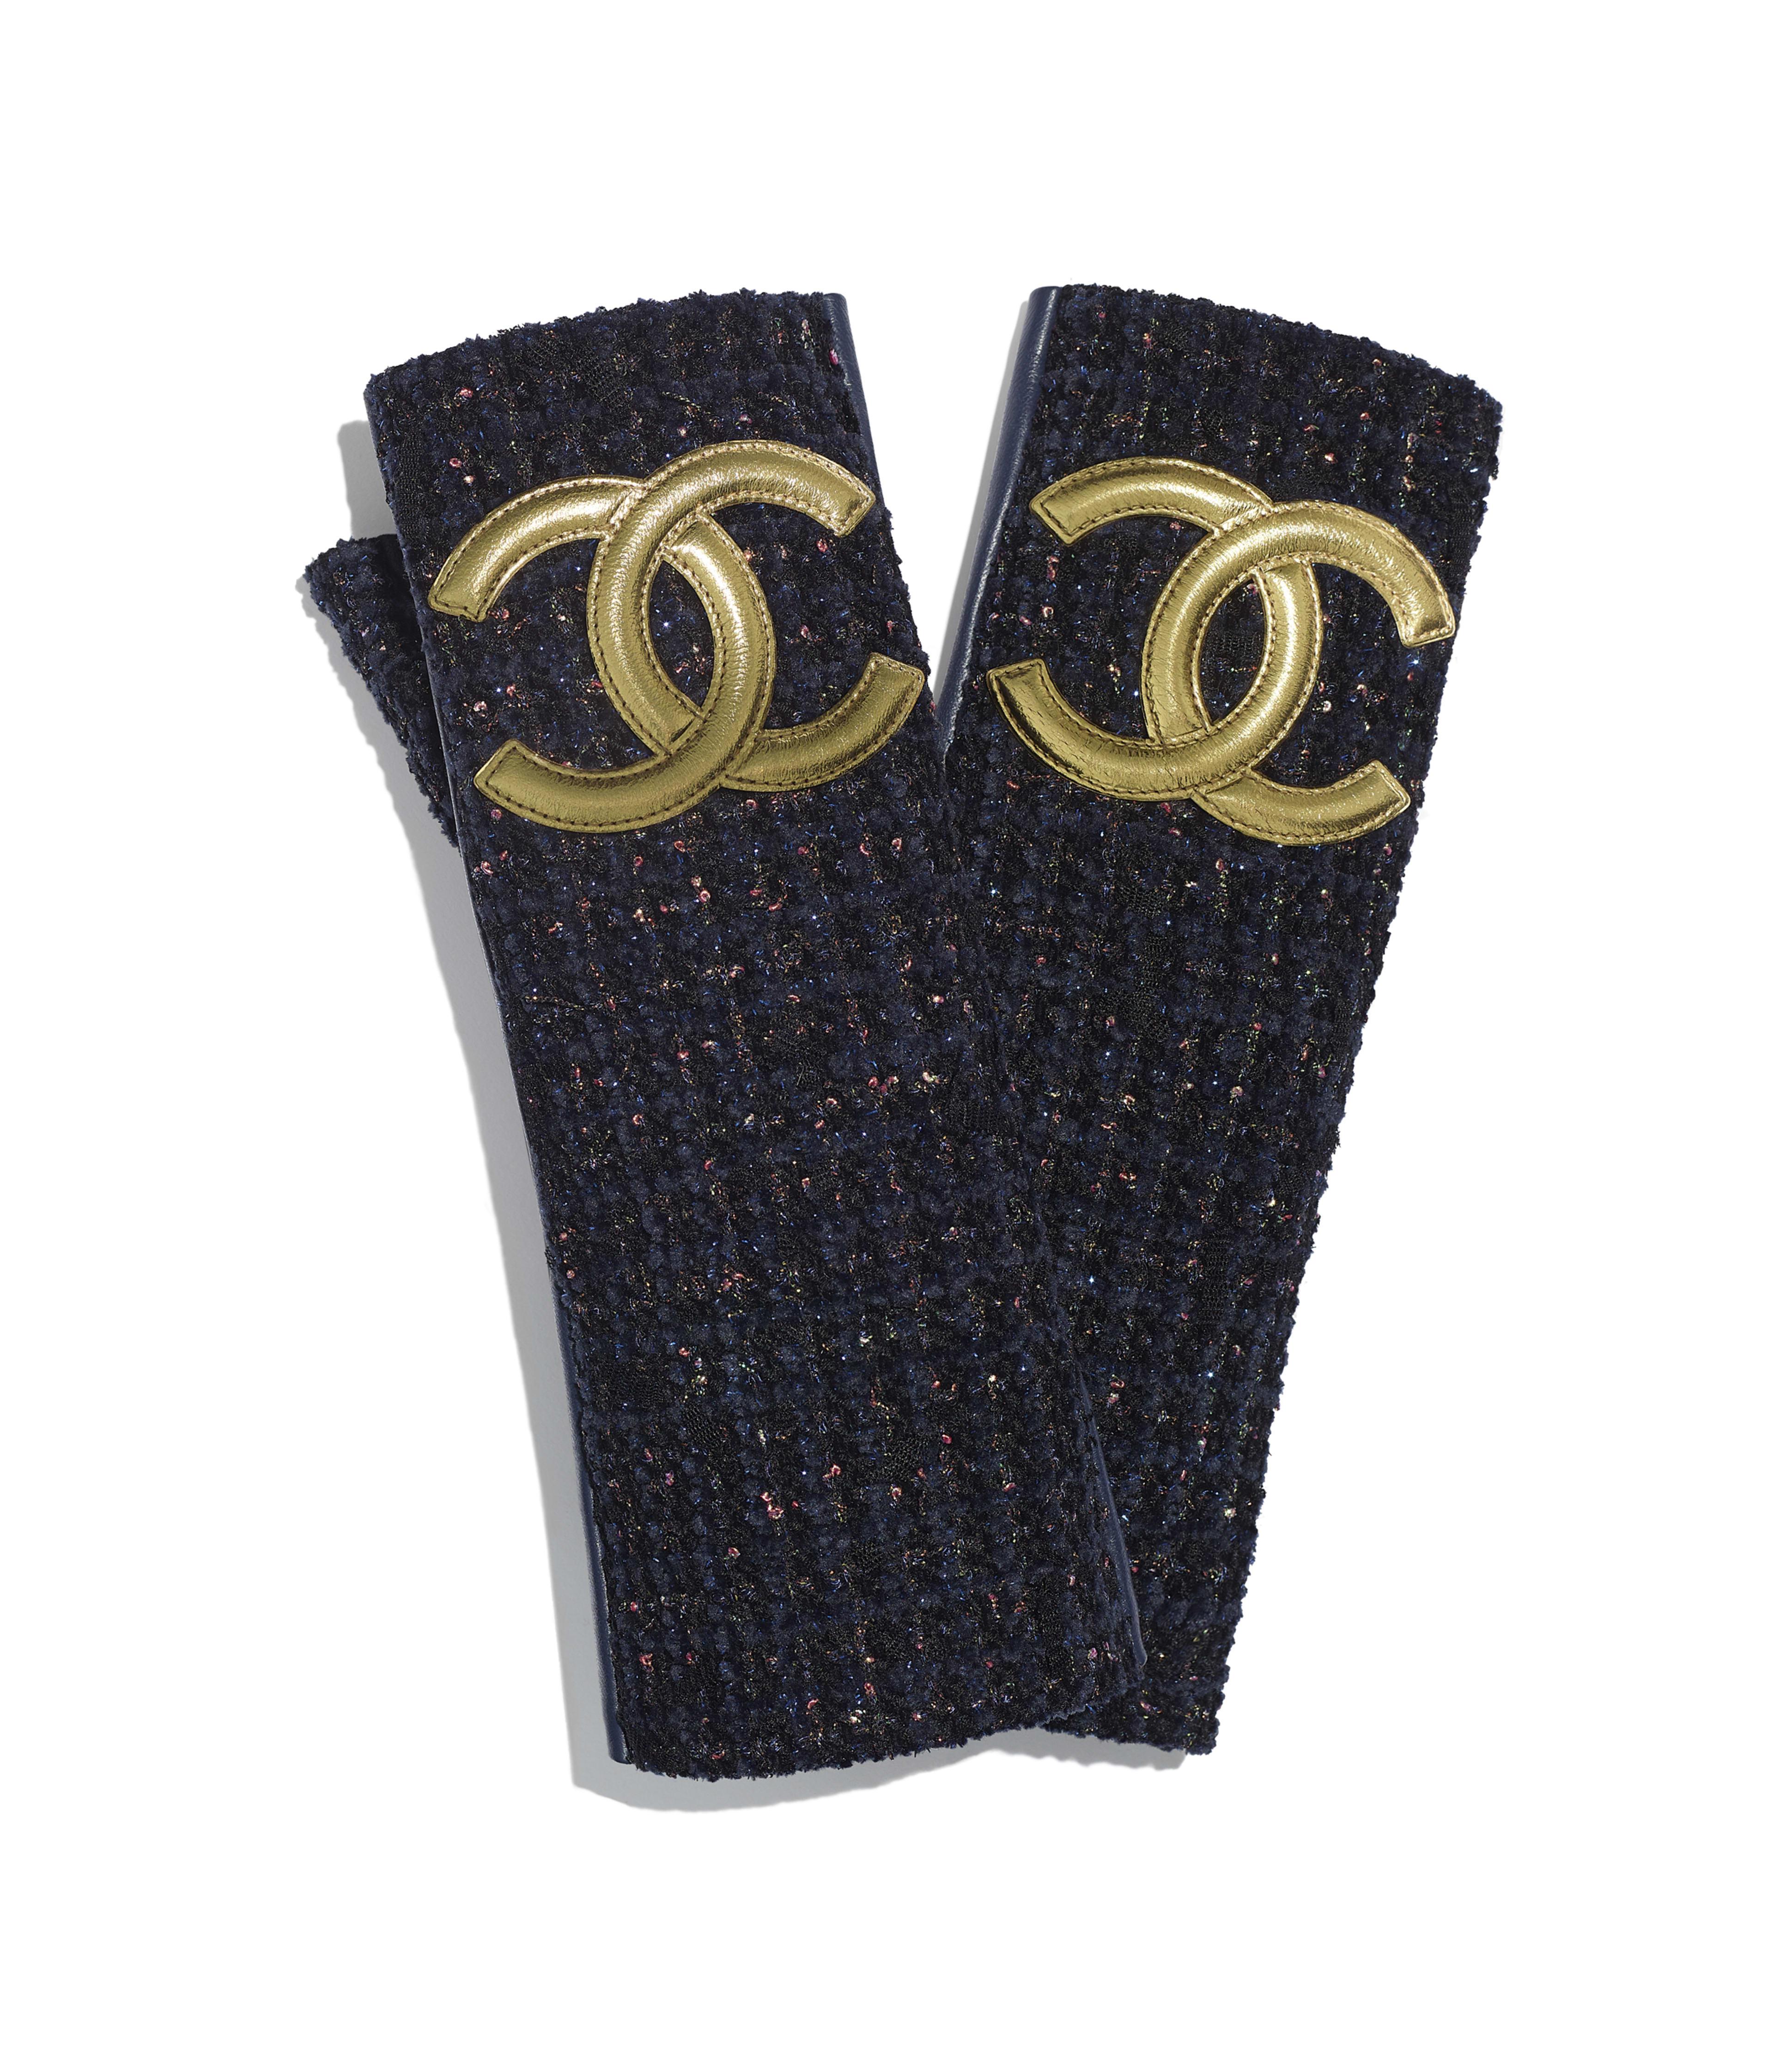 bd9f1cb9 Gloves Lambskin & Tweed, Navy Blue & Gold Ref. AA0731X12739C8789